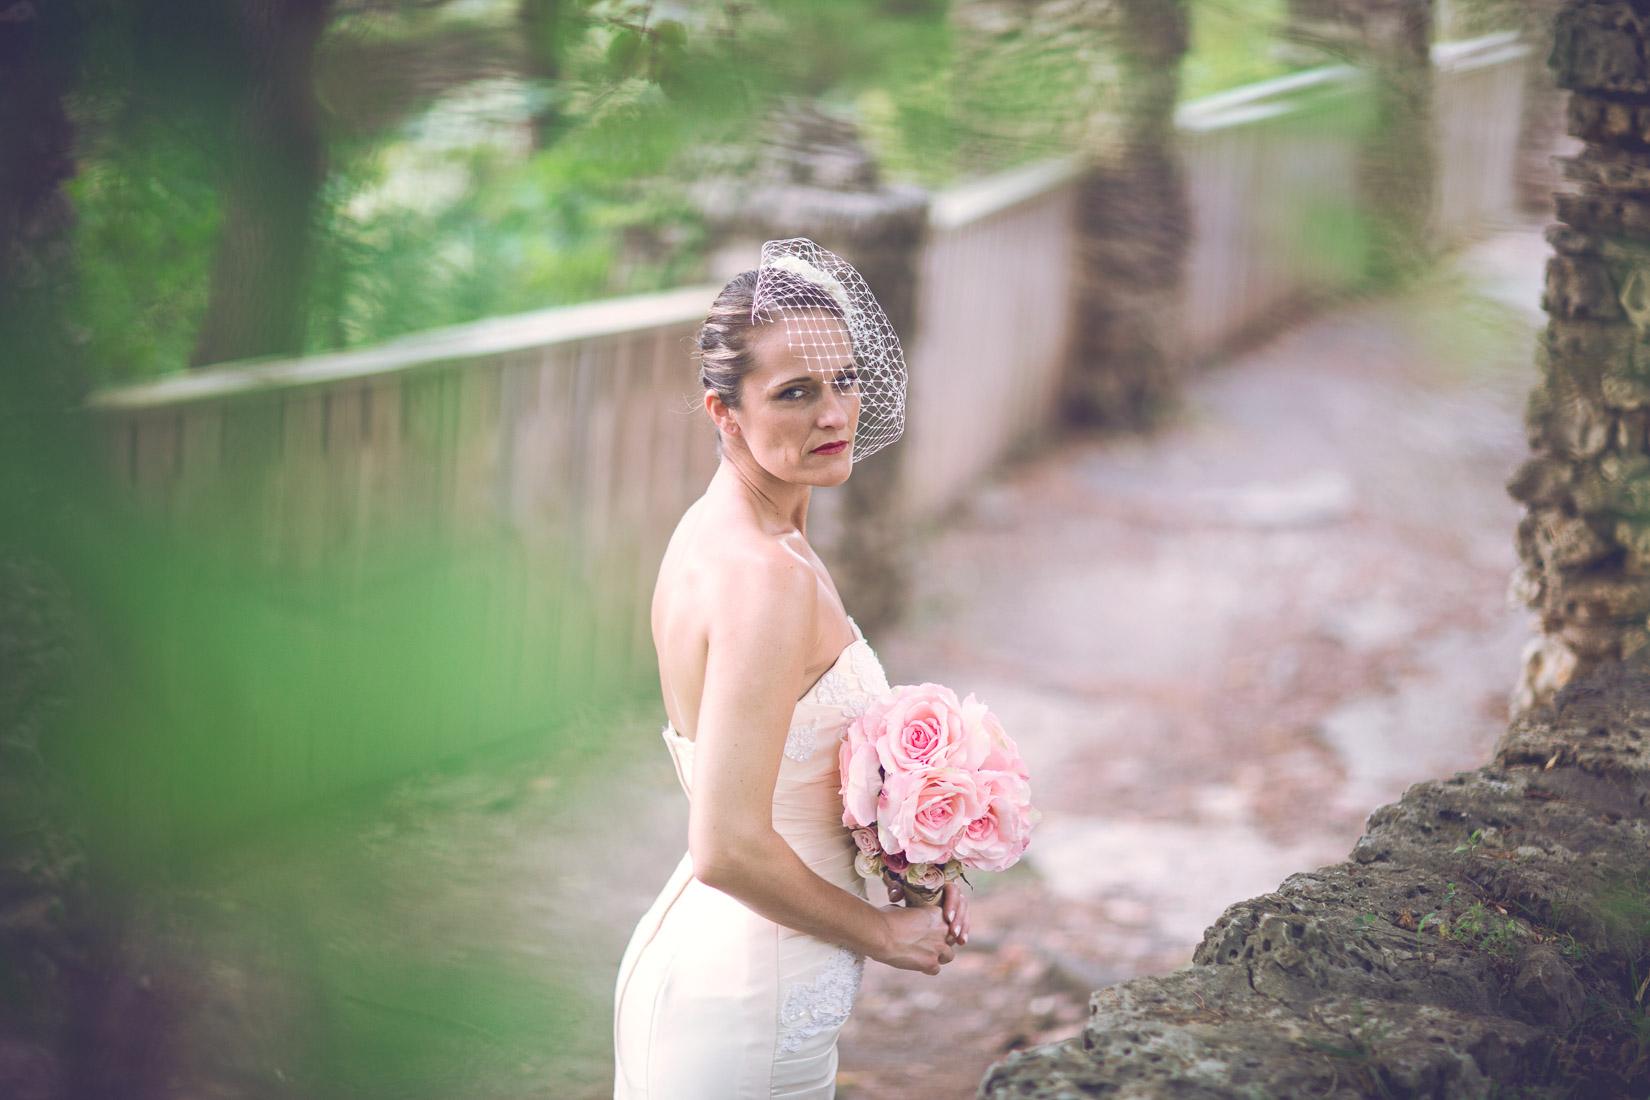 wedding-photo-westerville-ohio-15